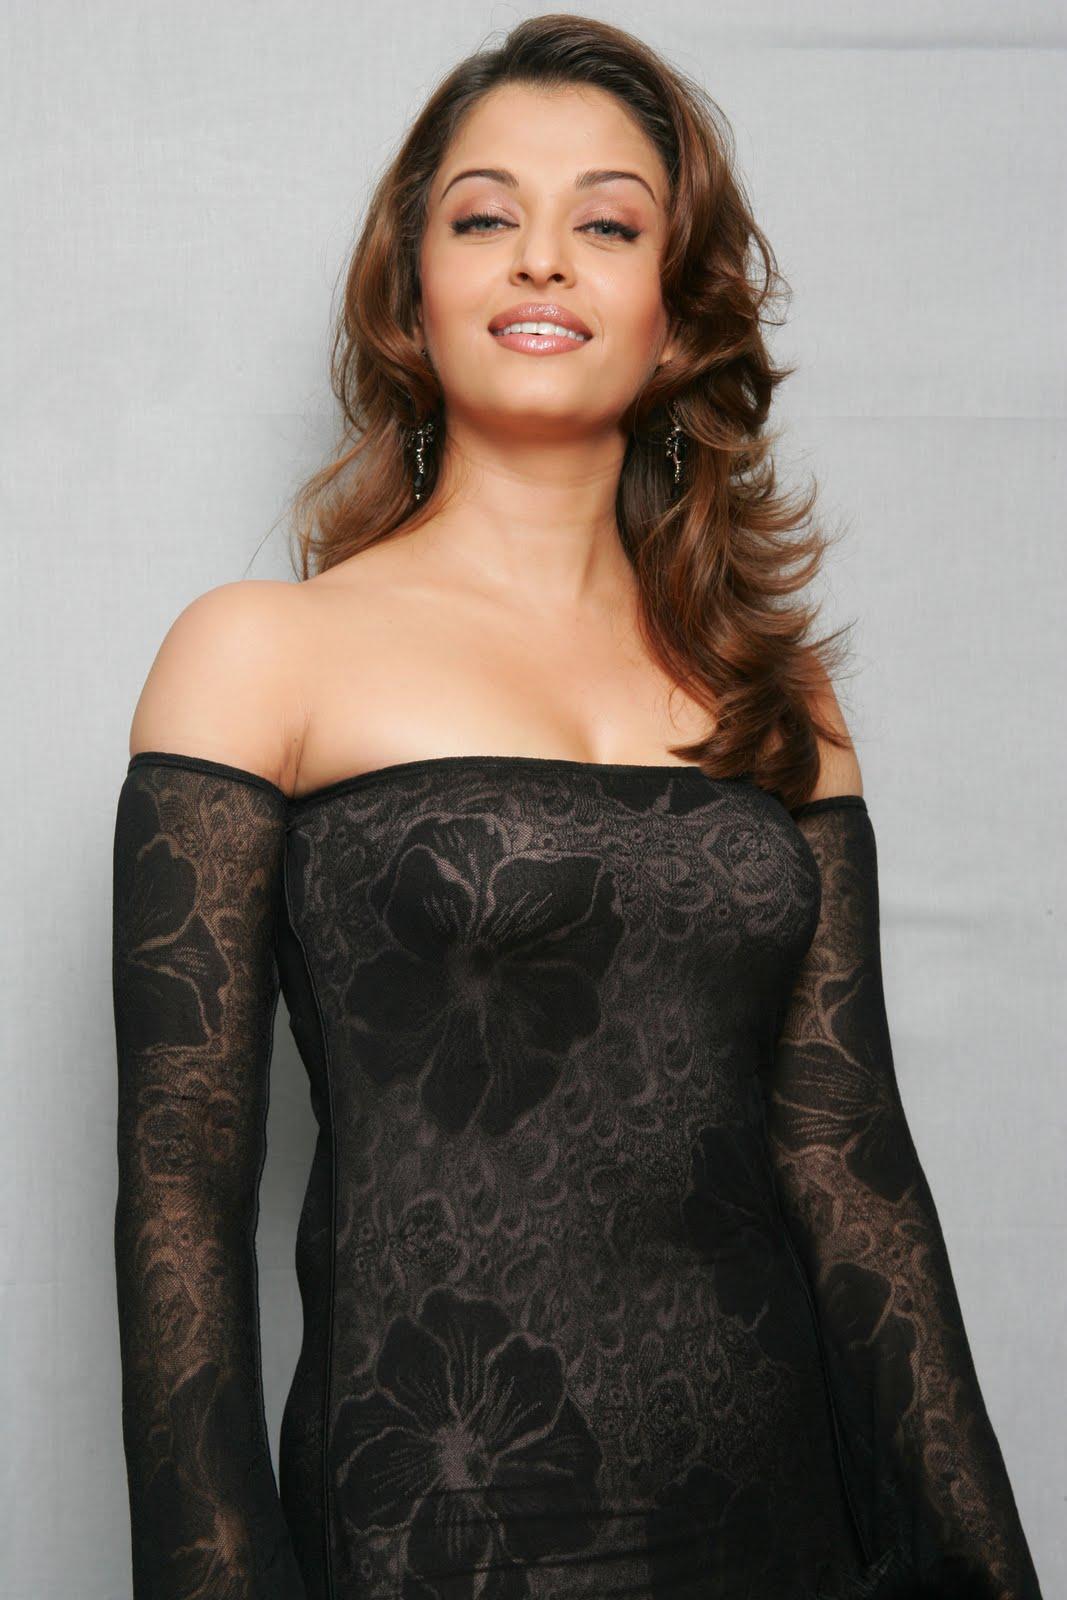 bollywood fan: Aishwarya Rai Pictures Gallery- 6: Hot